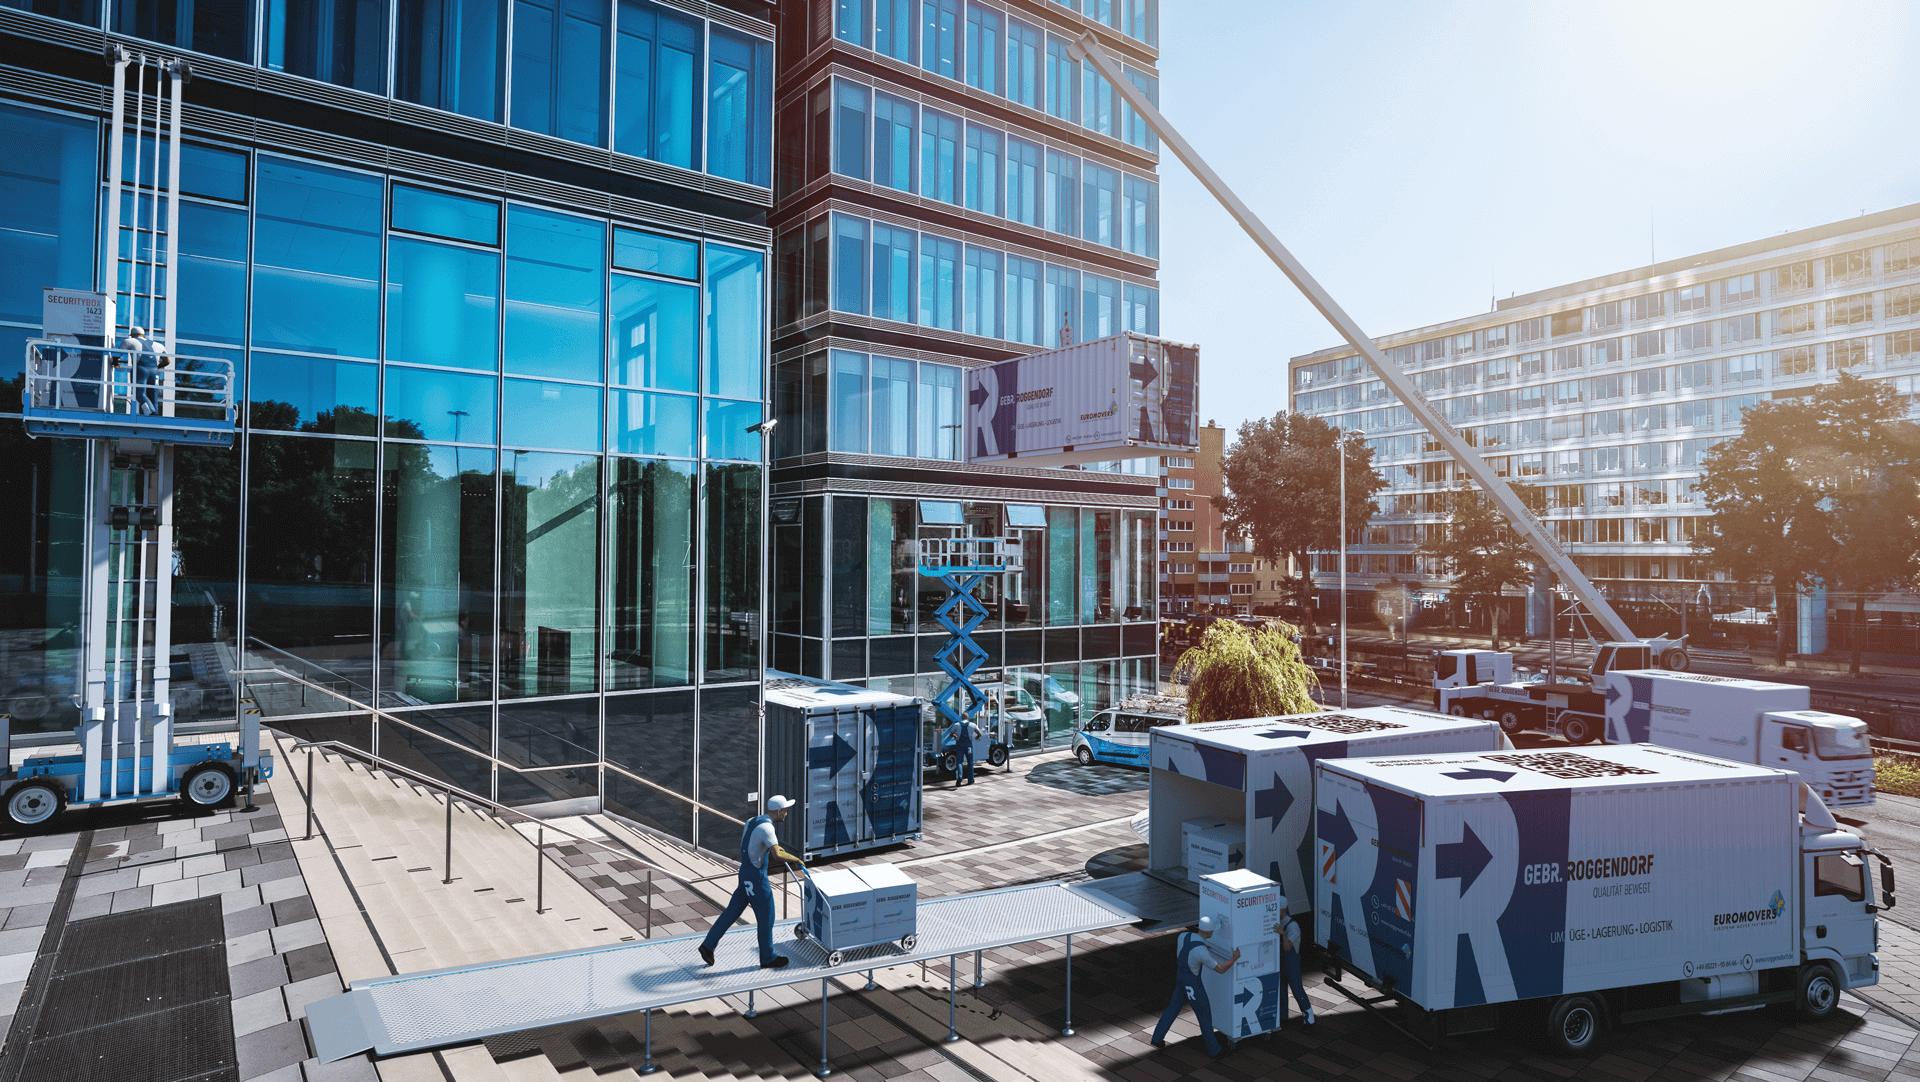 roggendorf umzug service firmenumzug bueroumzug und objektumzug header